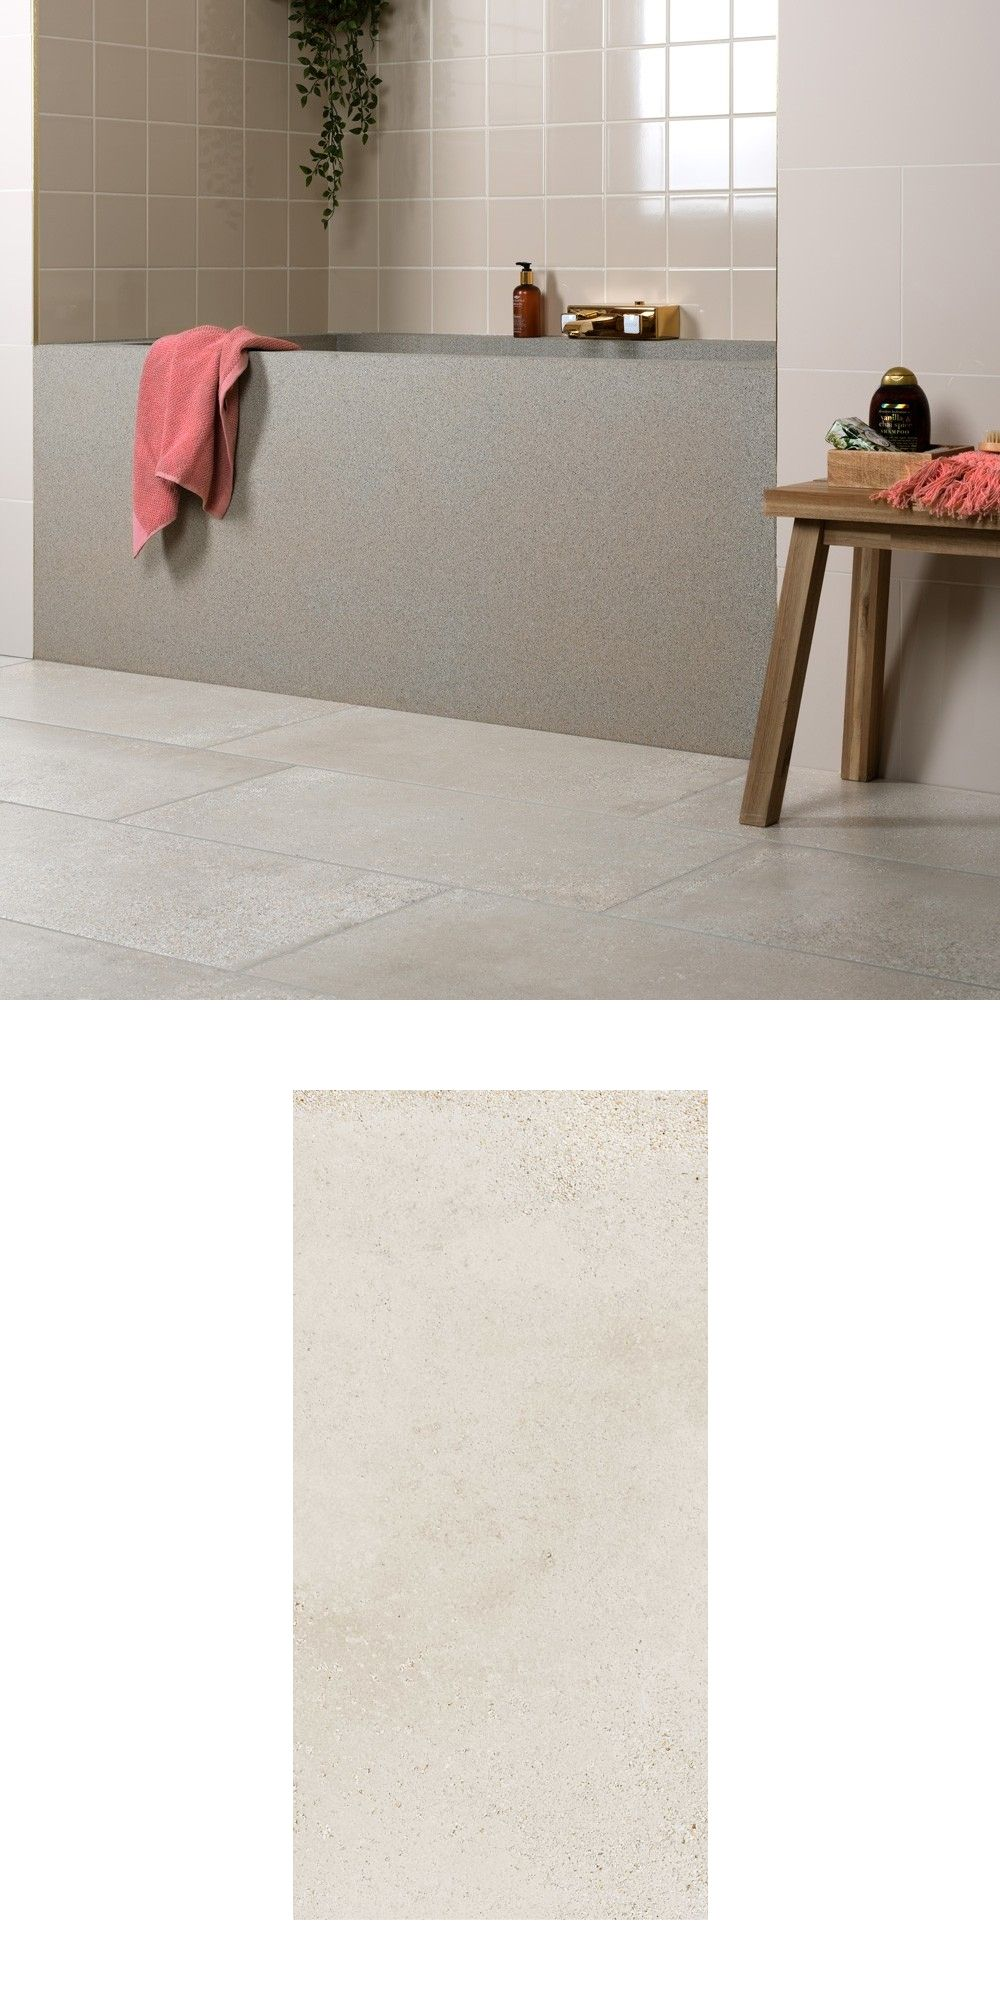 Harrogate Sand Tiles Grey Wall Tiles Wall And Floor Tiles White Wall Tiles